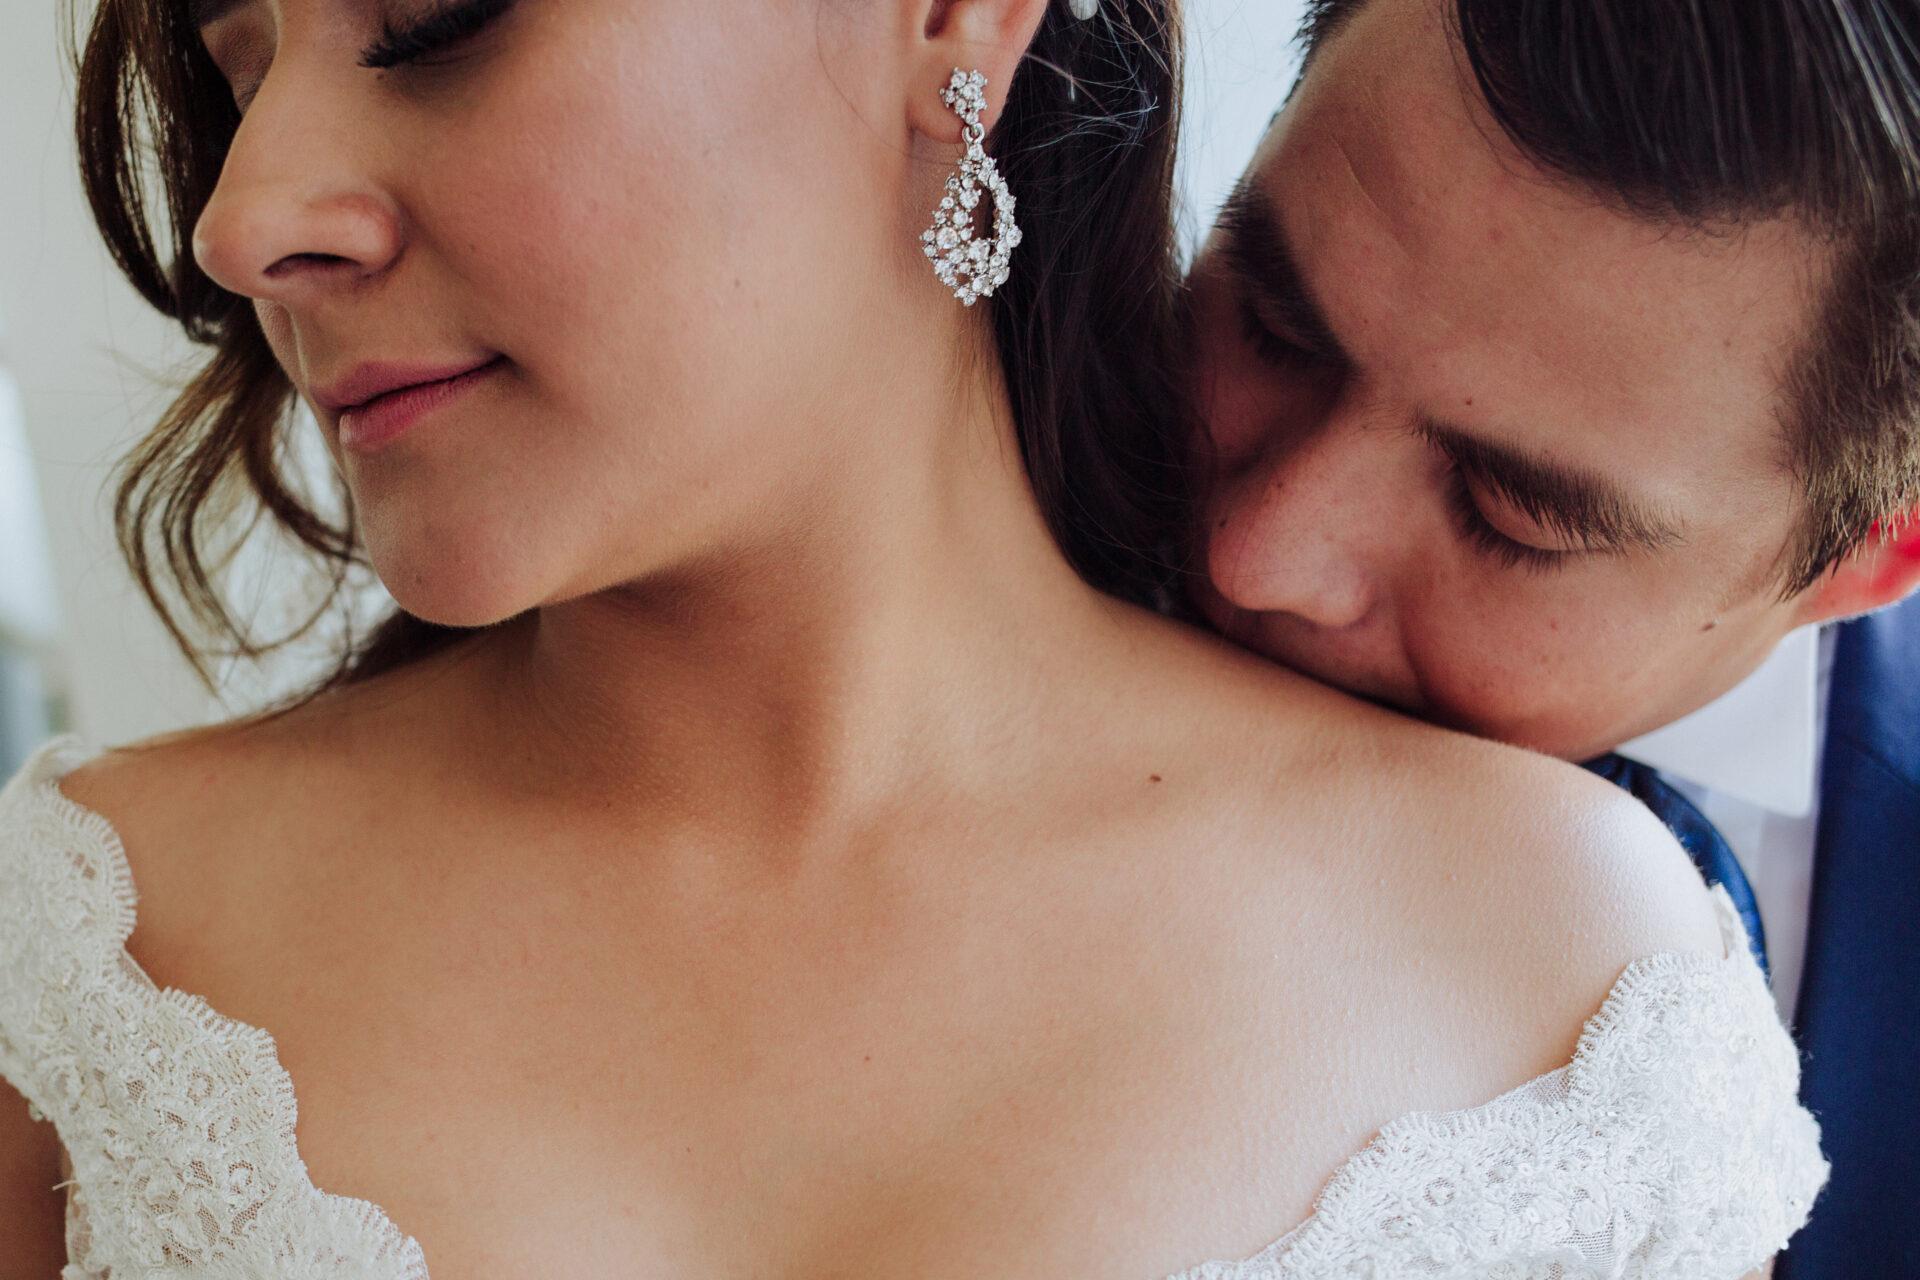 javier_noriega_fotografo_bodas_torreon_coahuila_zacatecas_wedding_photographer25a